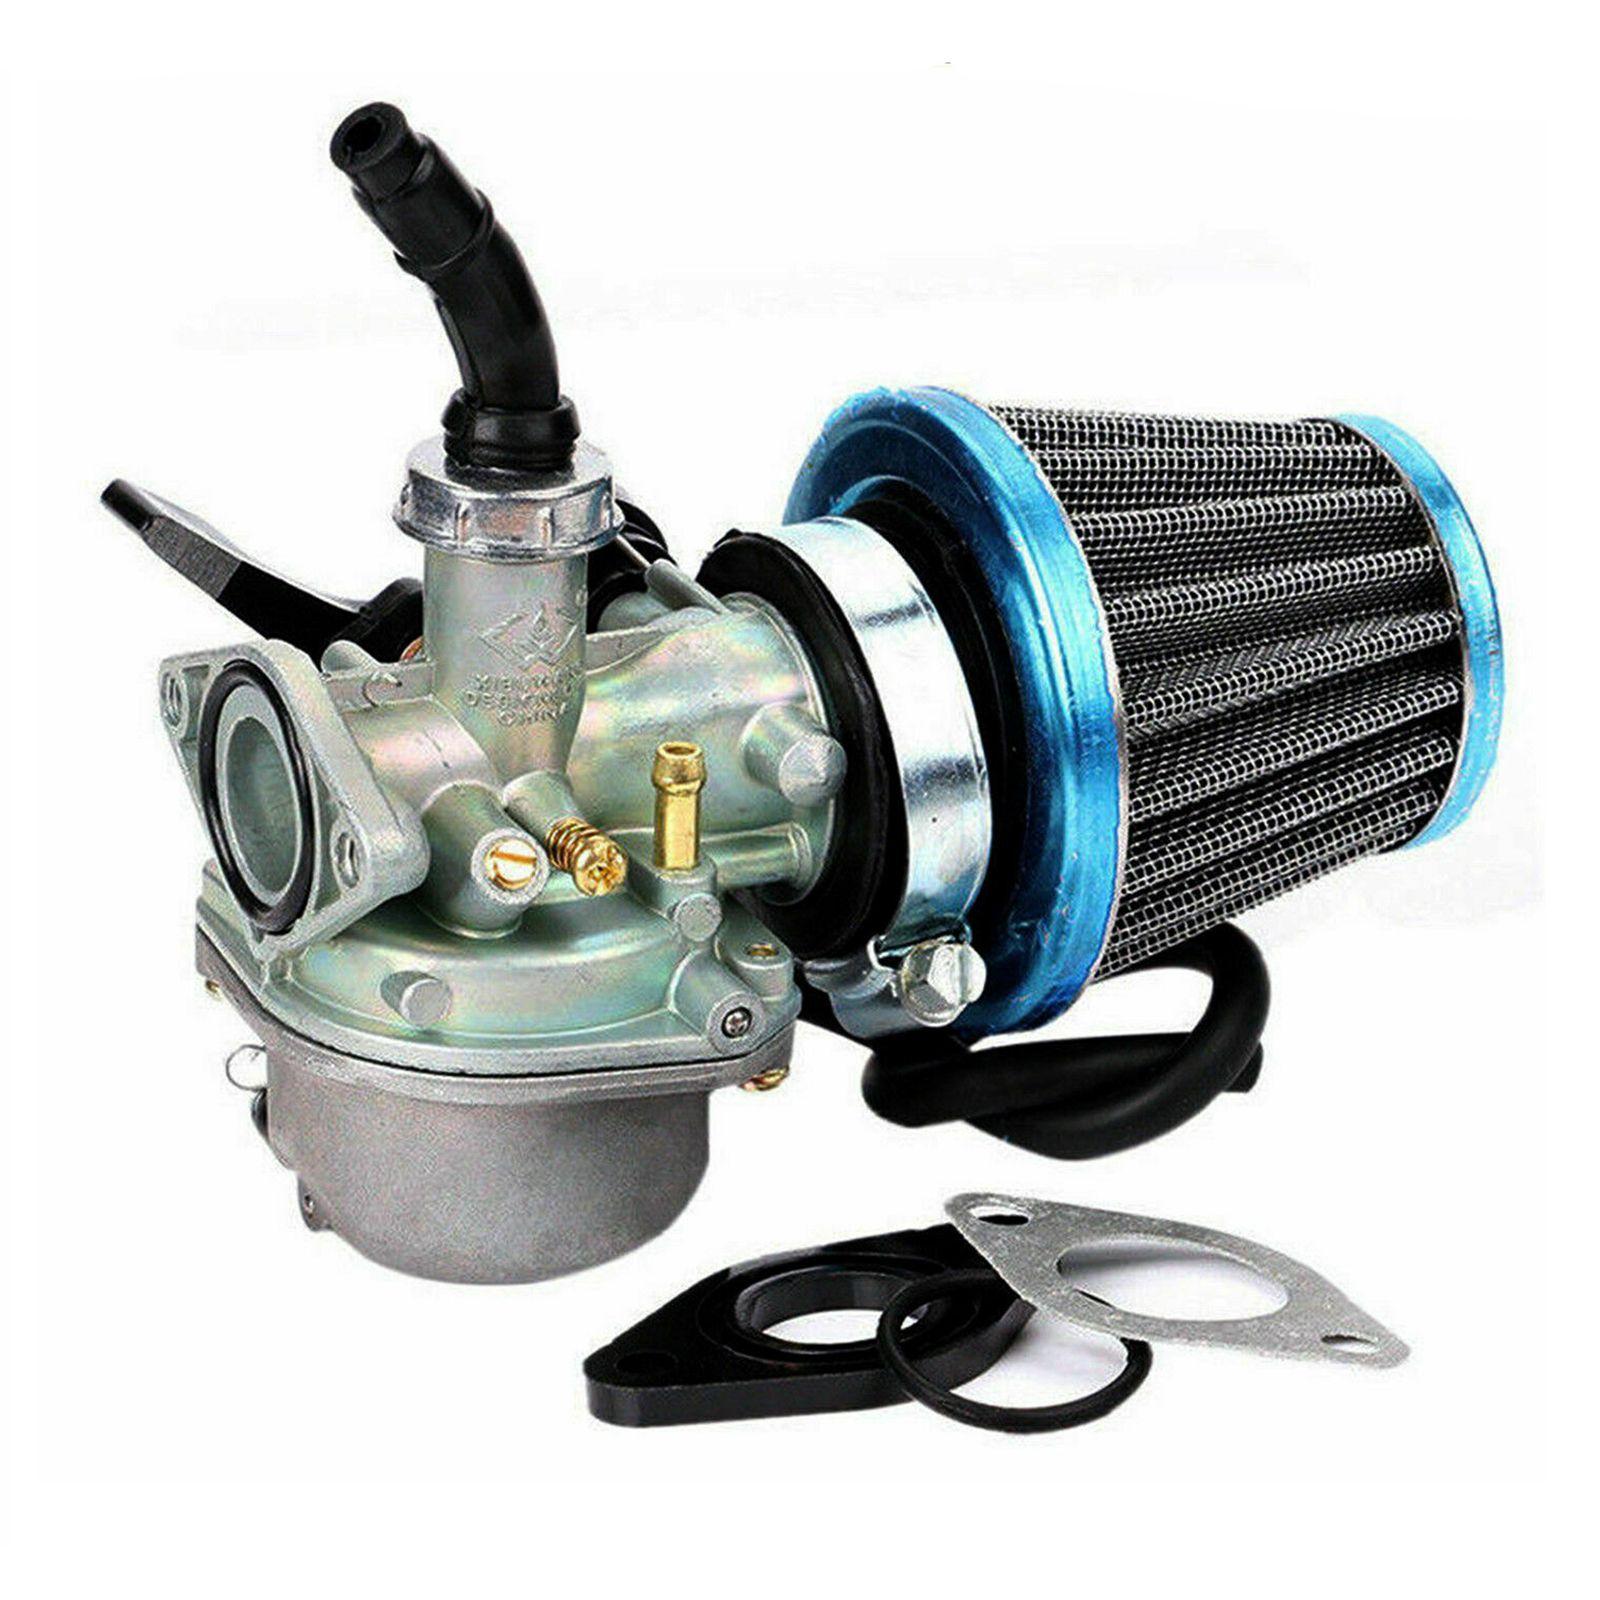 PZ19 Carb Per 50cc 70cc 90cc 110cc 125cc motociclo ATV sporcizia filtro bici carburatore W / Air